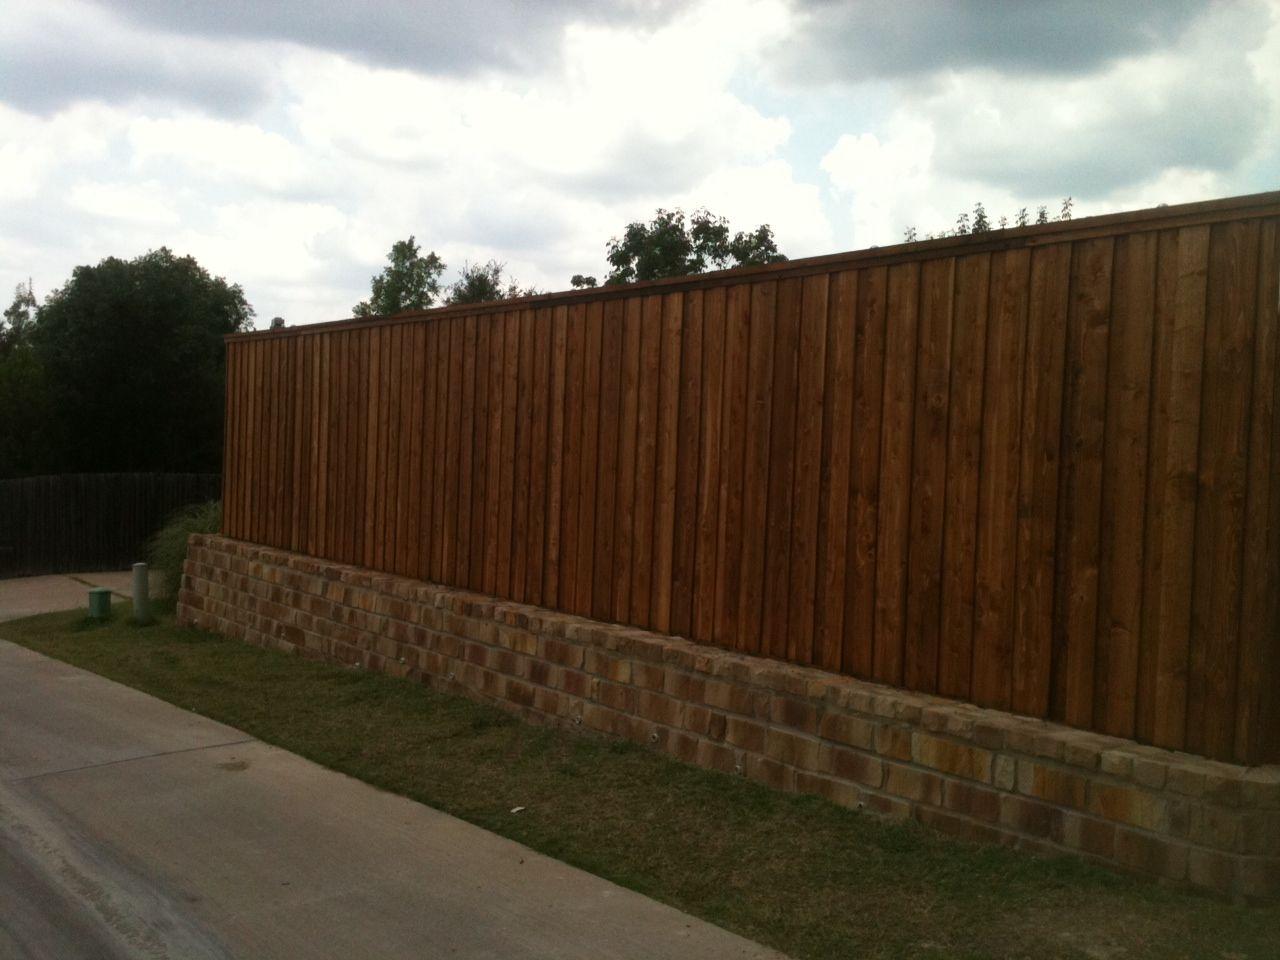 Stone Retaining Wall Backfill And Cedar Fence Board On